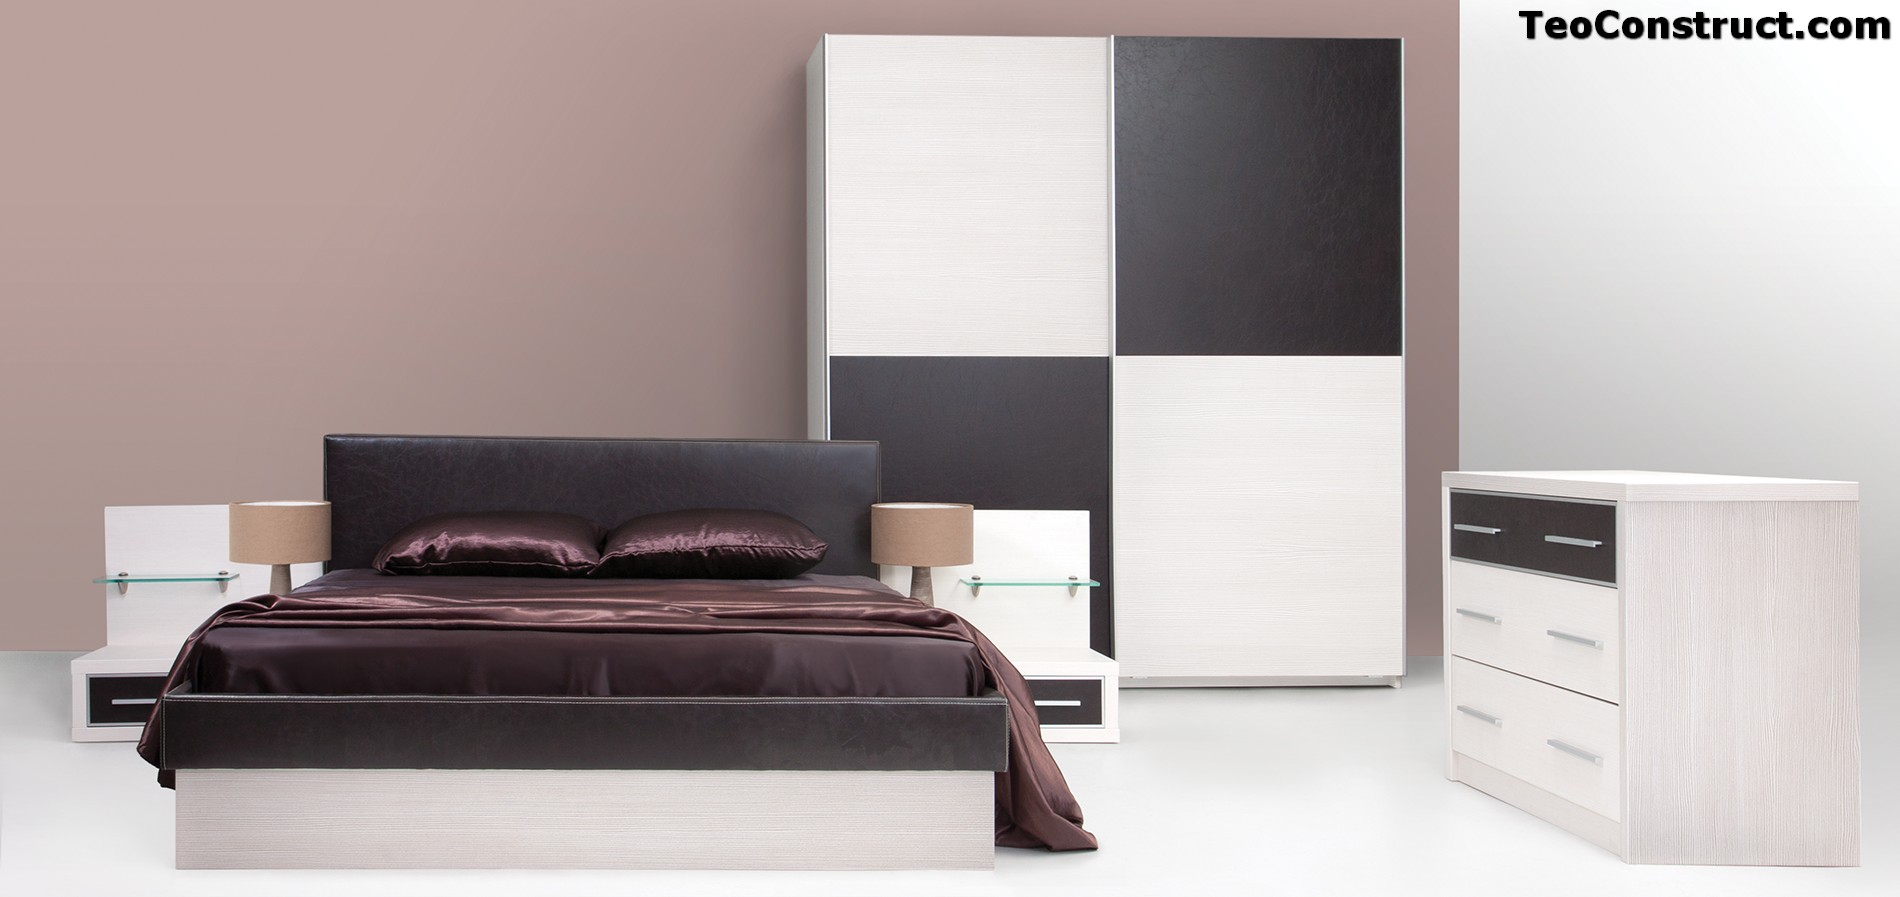 Dormitoare Magnum de calitate01